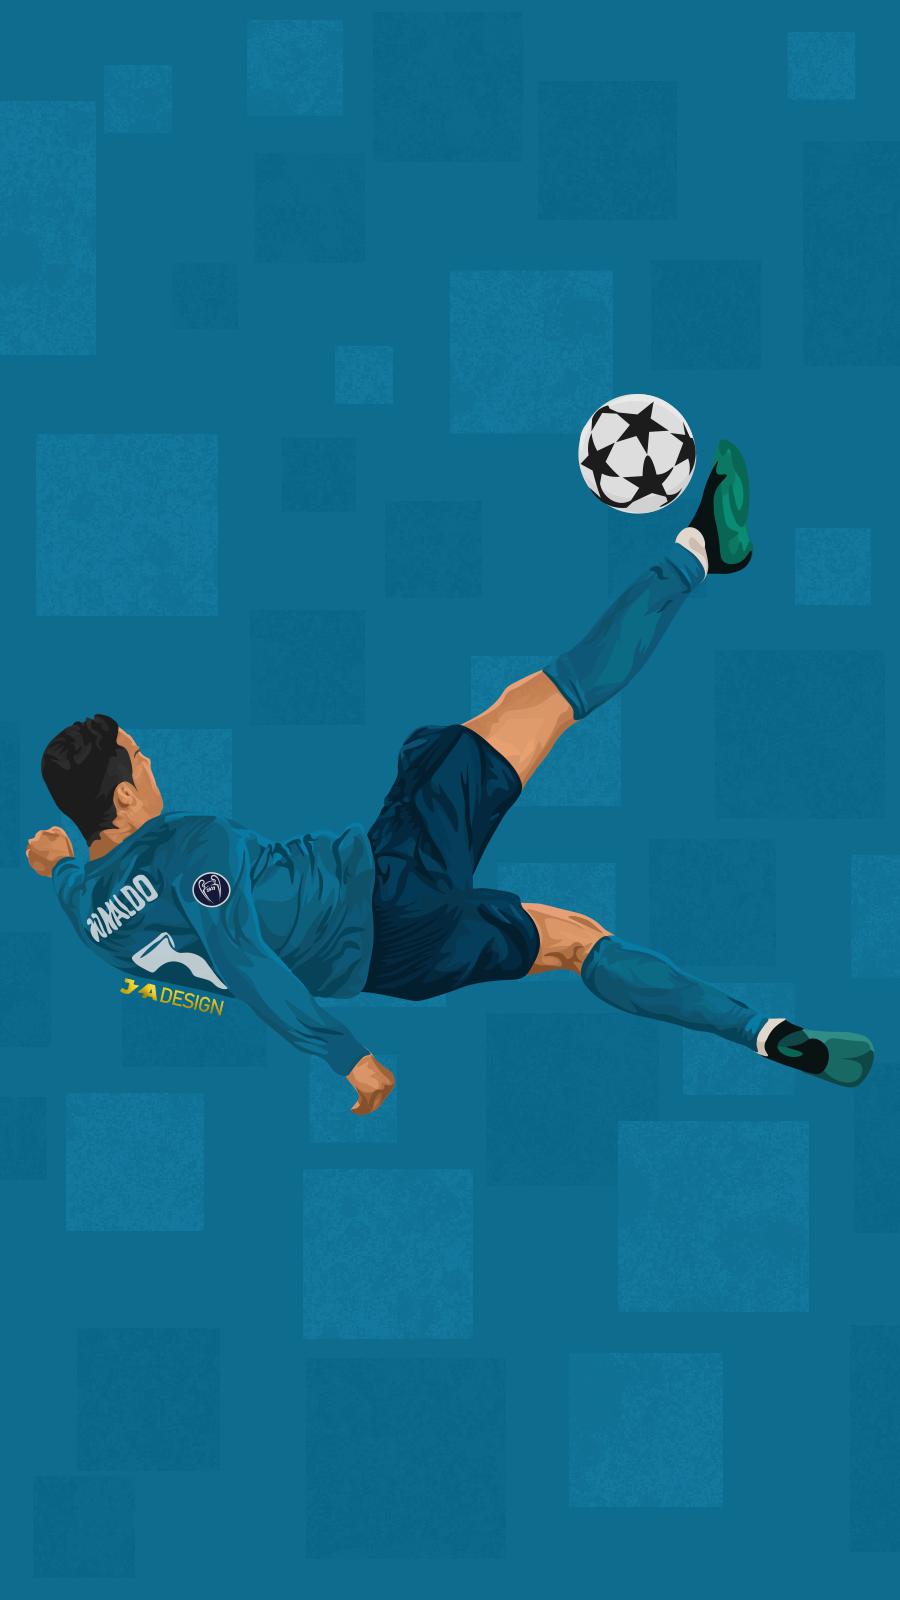 Cristiano Ronaldo Overhead Kick Vs Juventus On Behance